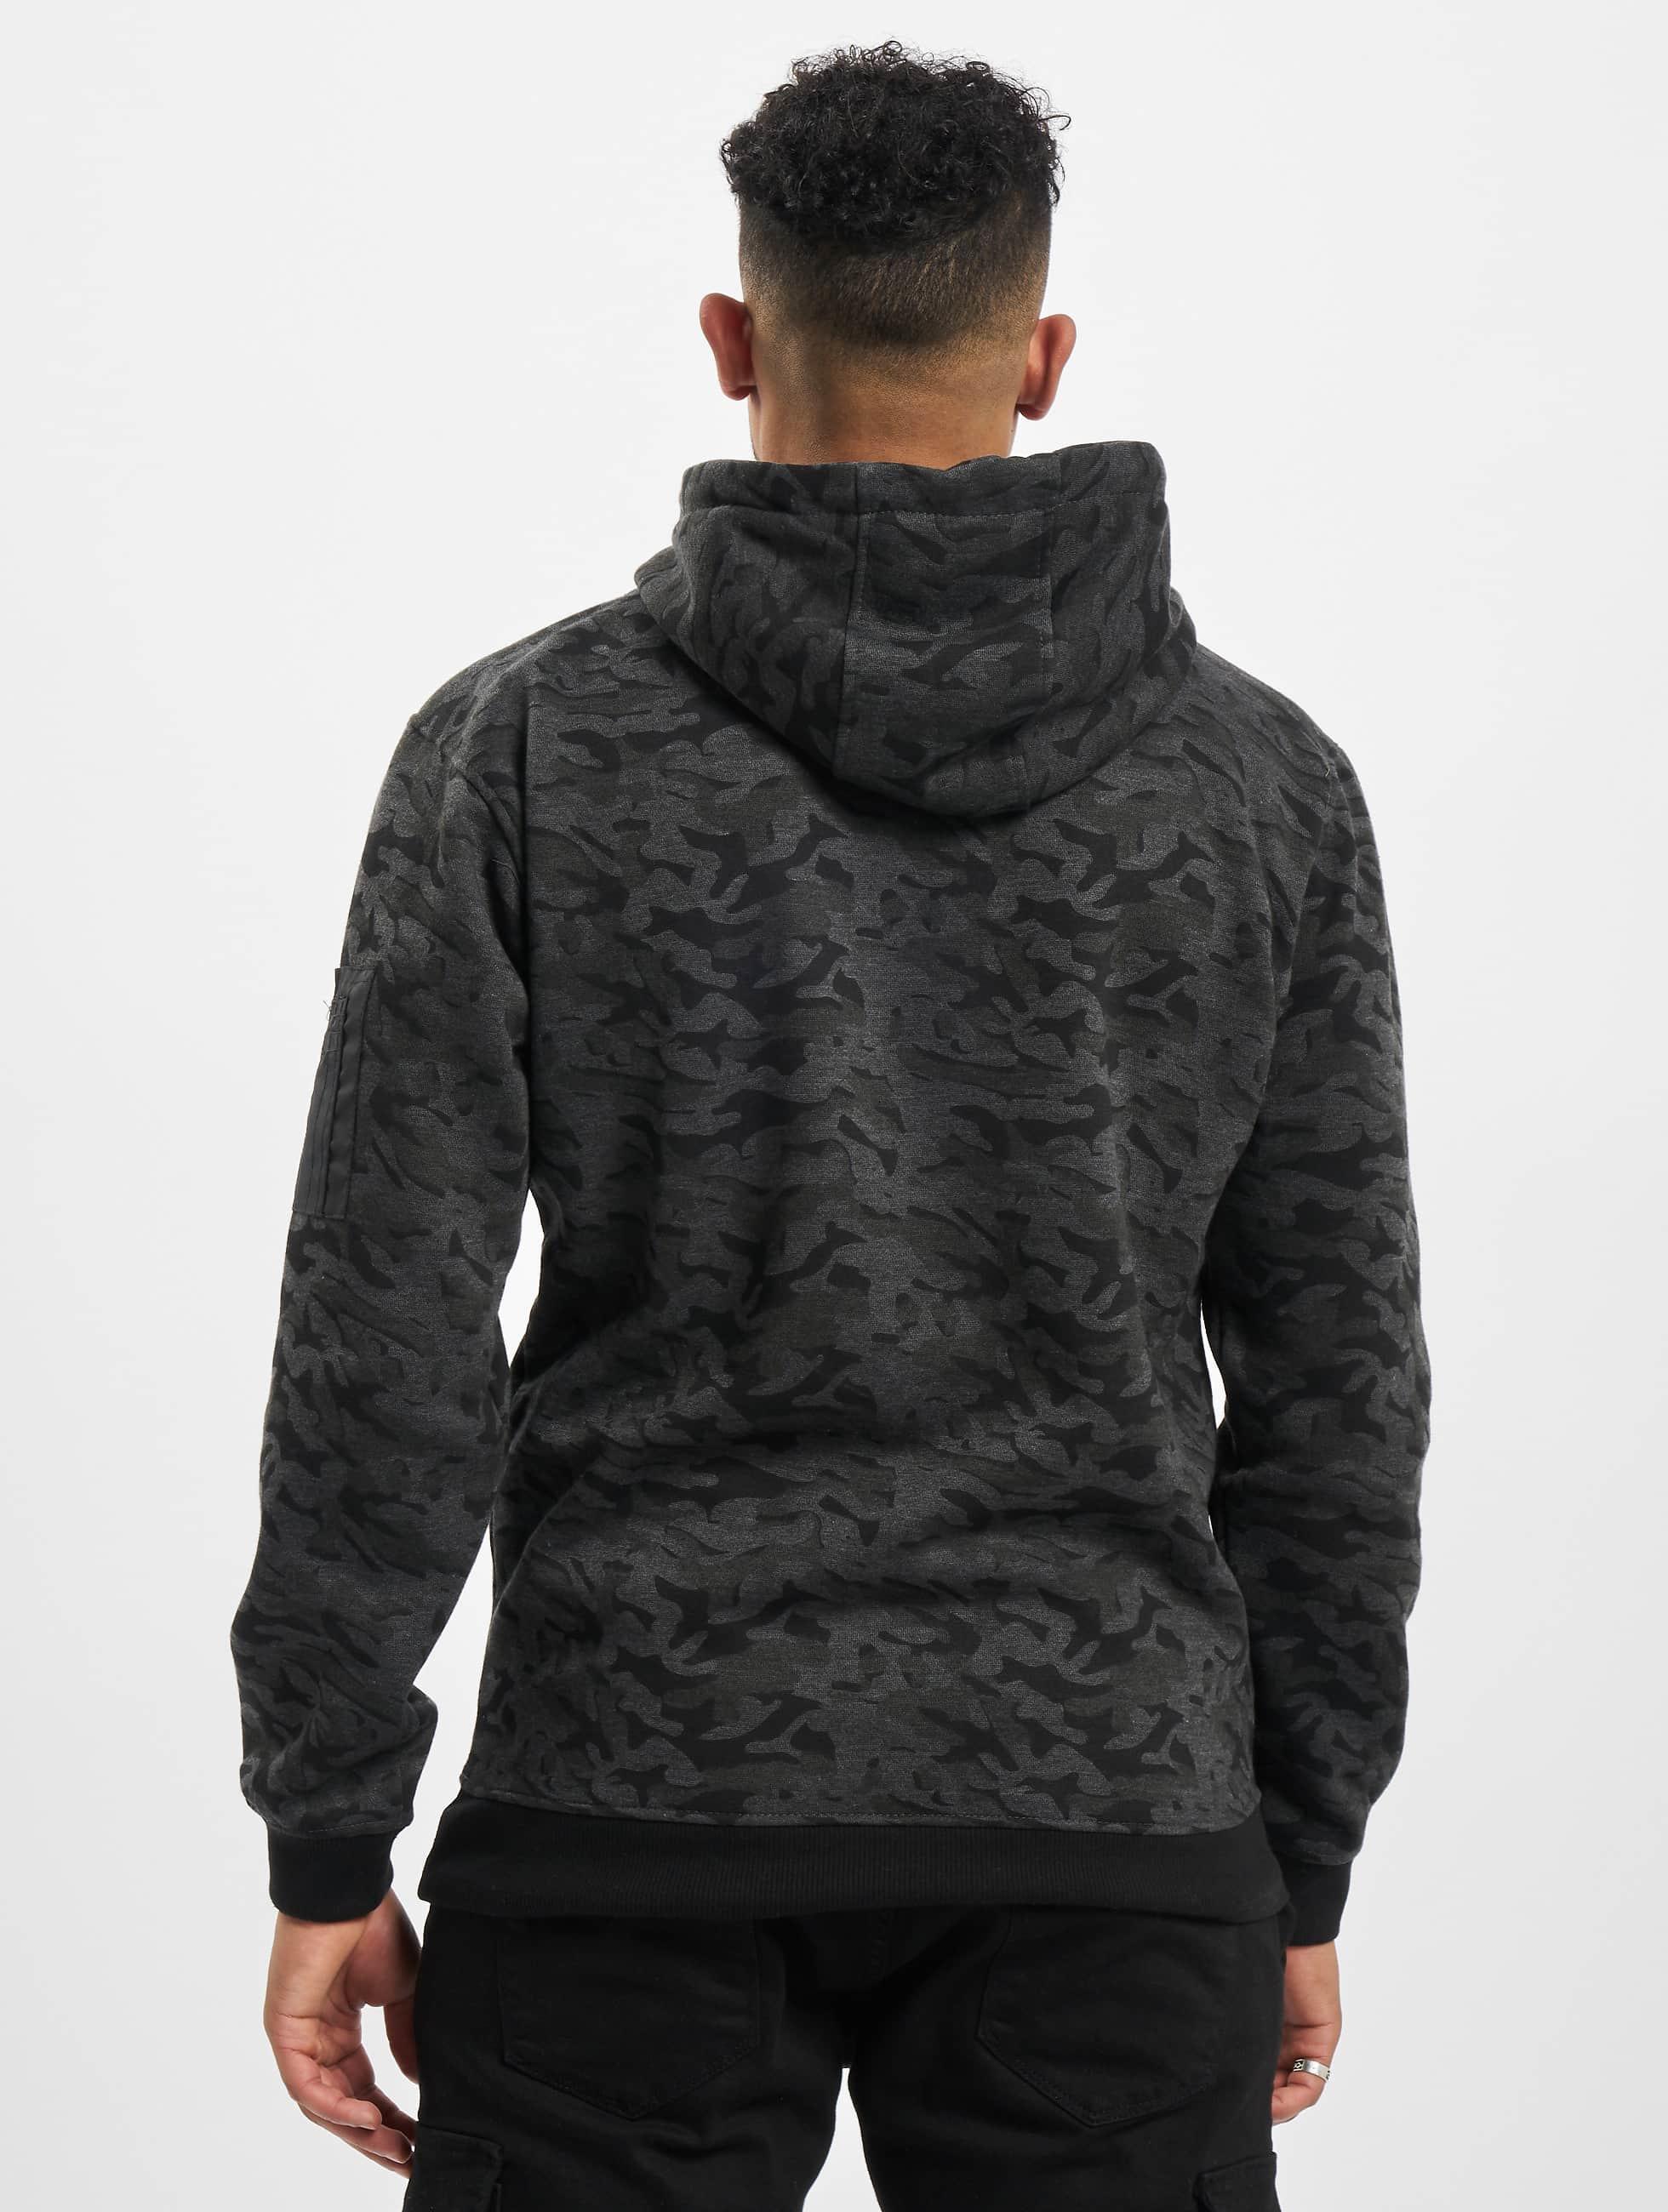 Urban Classics Hoodie Sweat Camo Bomber kamouflage